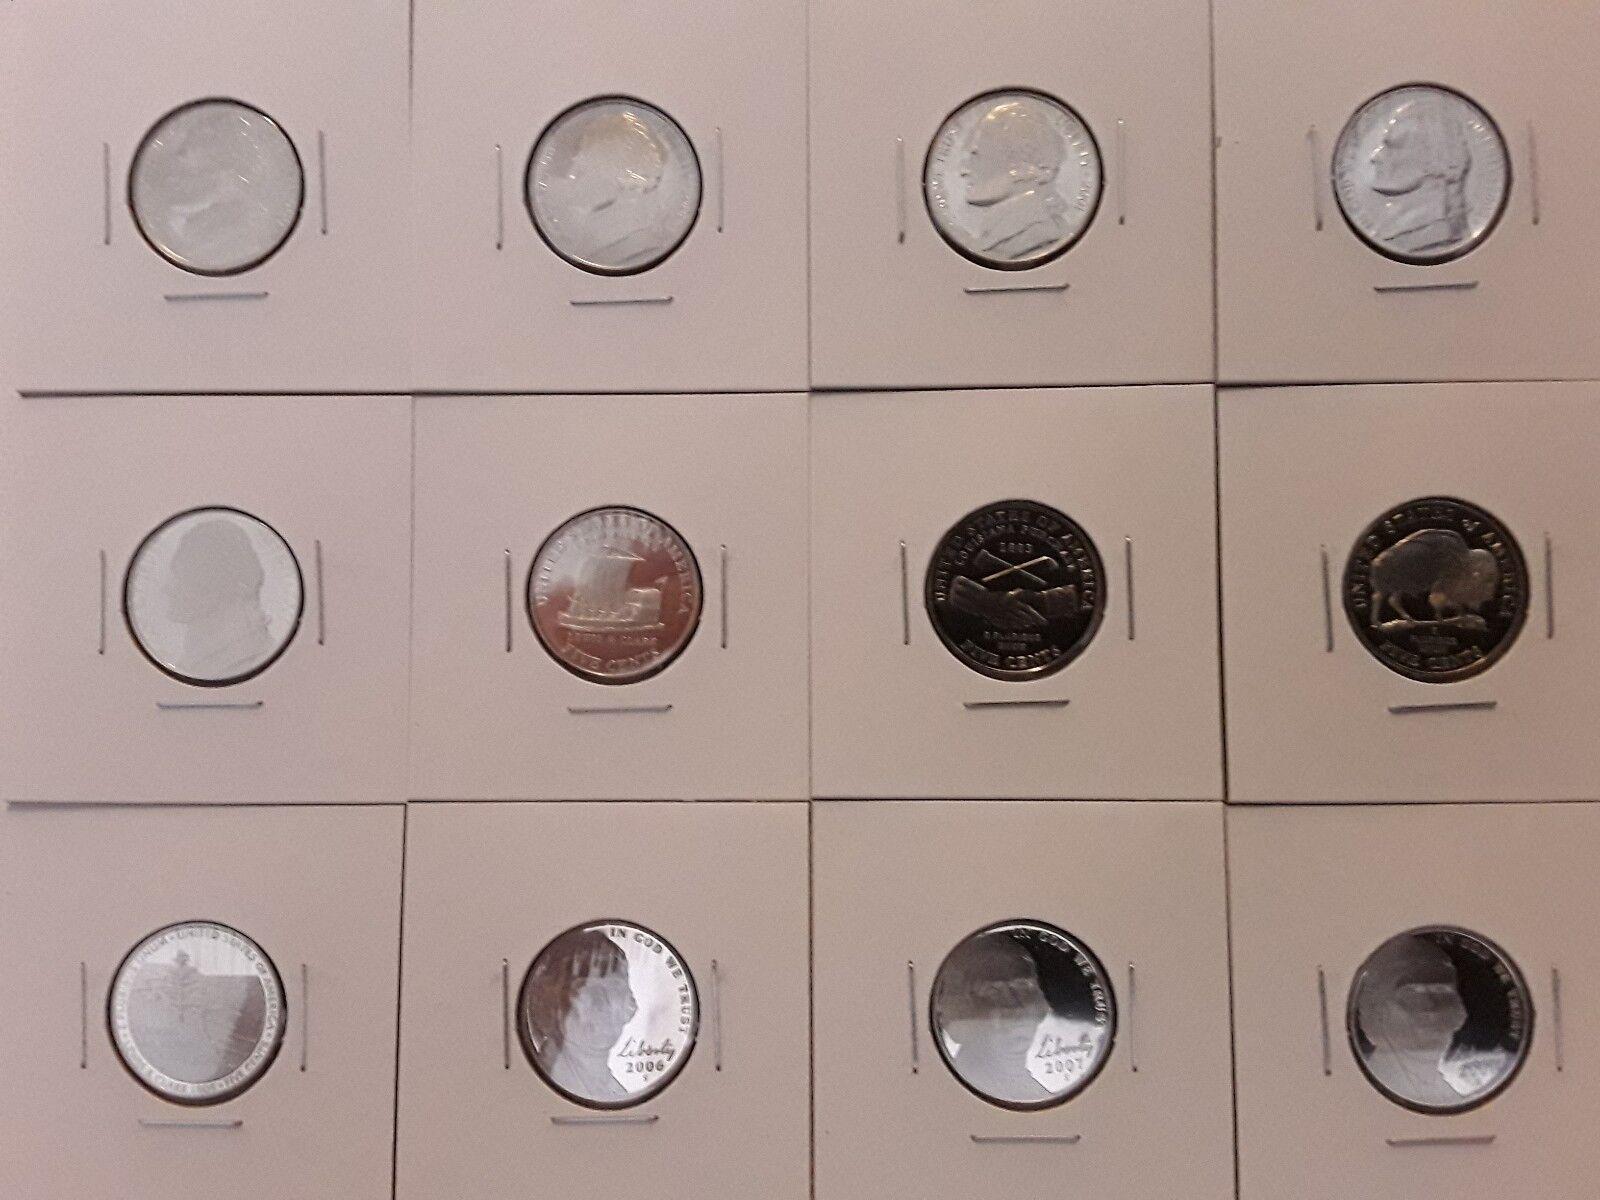 TEN ROLLS OF BU 2010-P MINT  BANK WRAPPED PENNYS